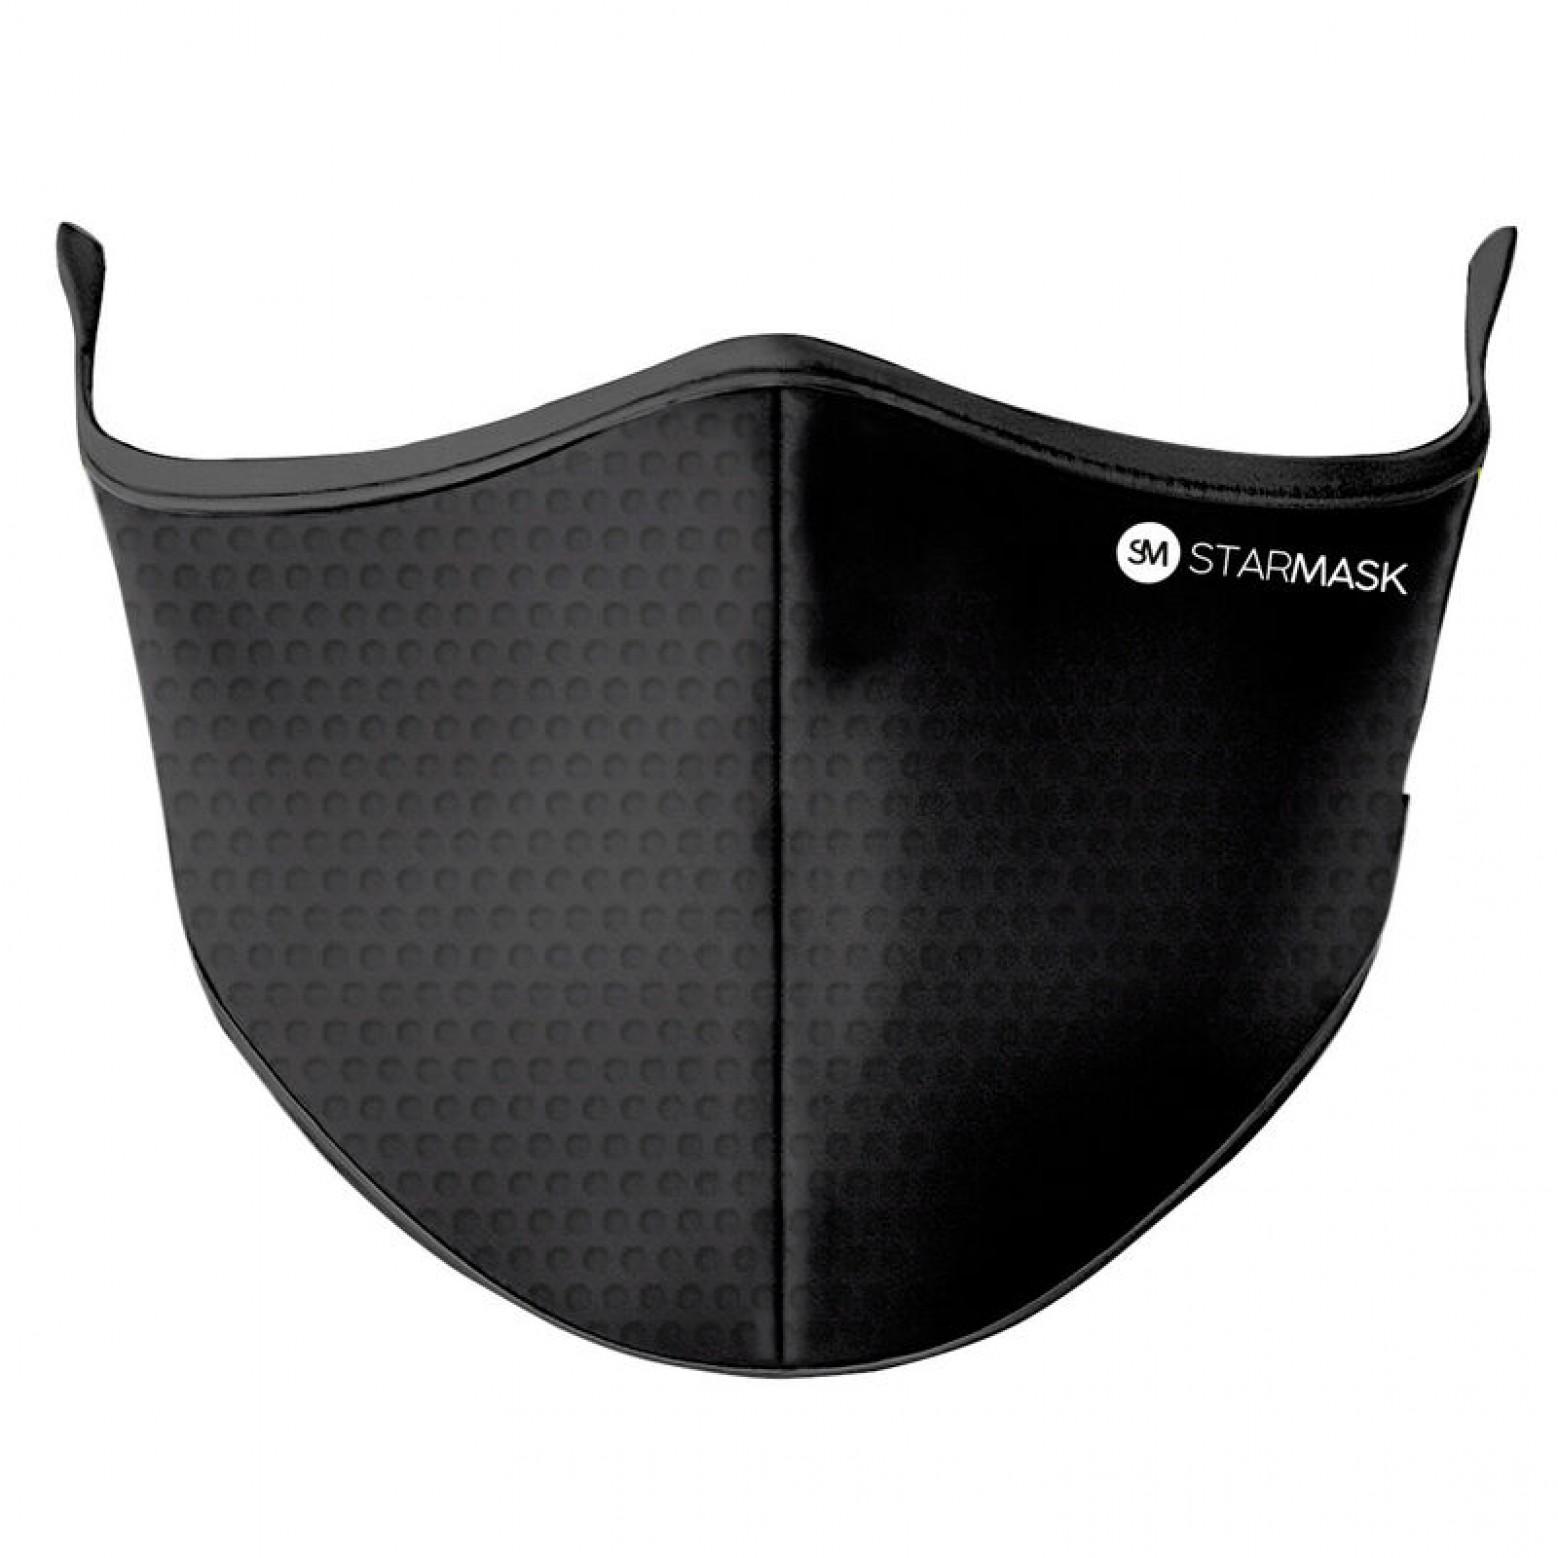 Star Mask herbruikbaar mondkapje carbon maat m